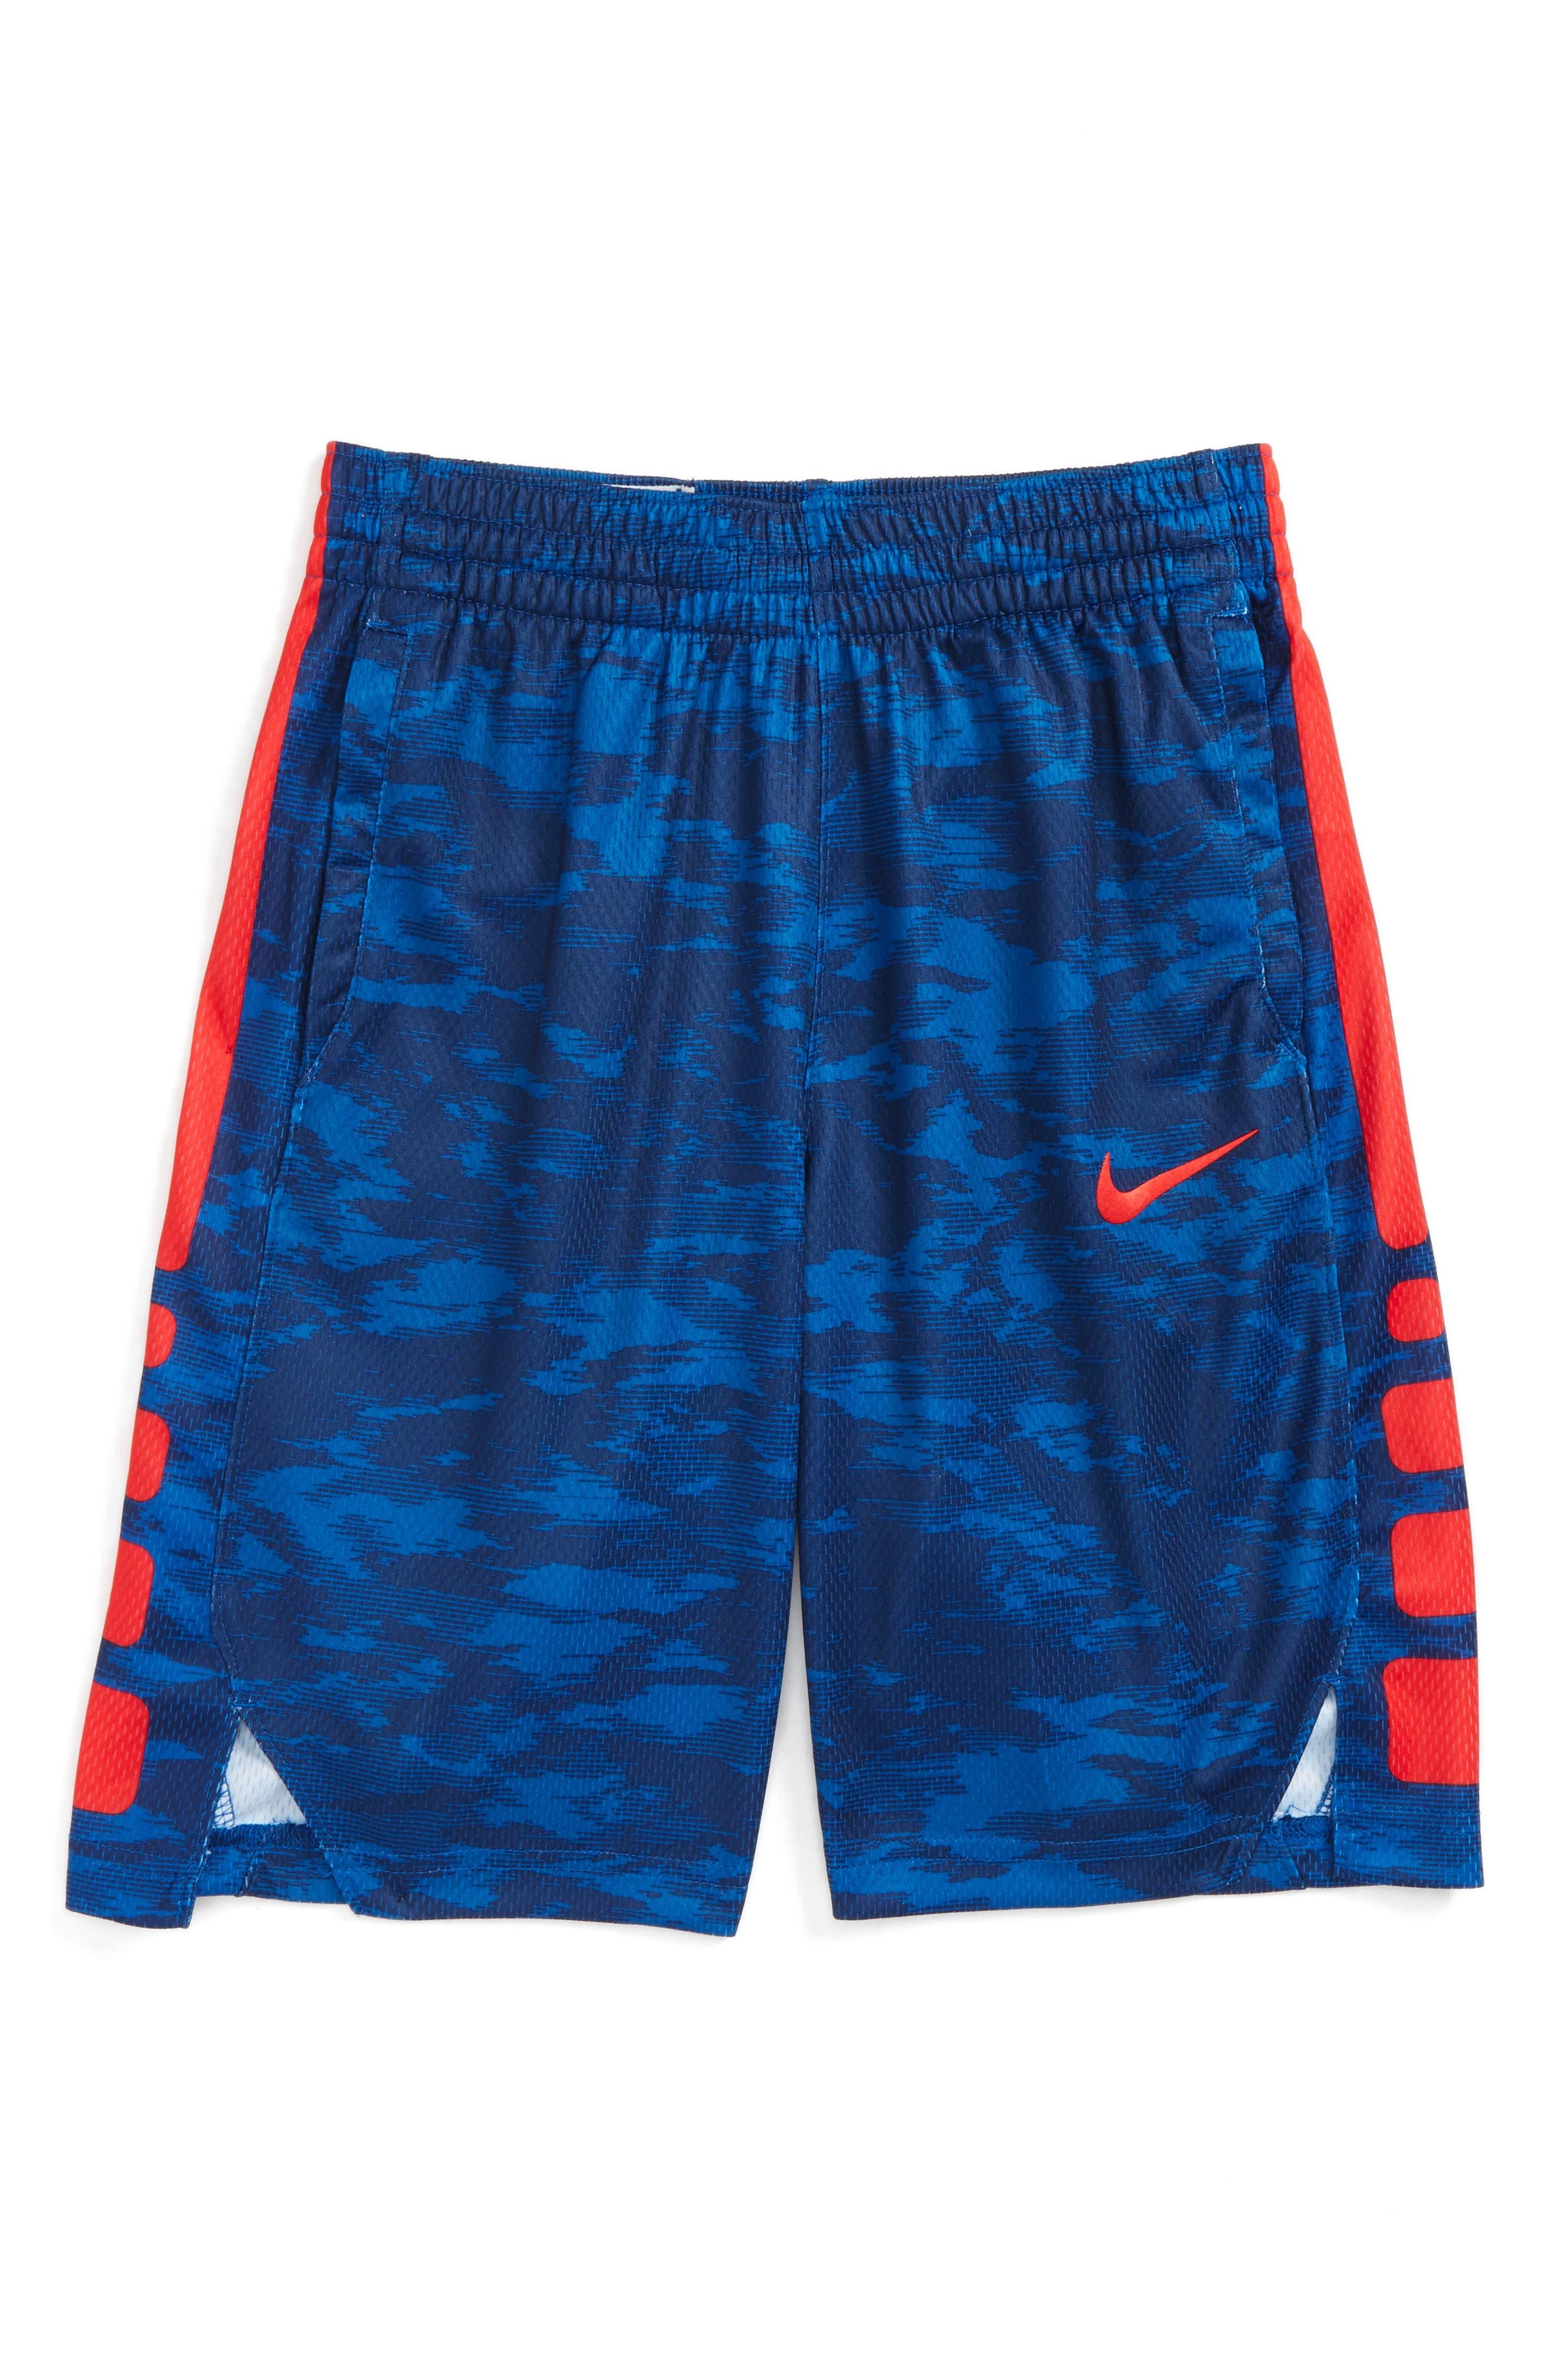 Dry Elite Basketball Shorts,                         Main,                         color, Binybl/ Unvred